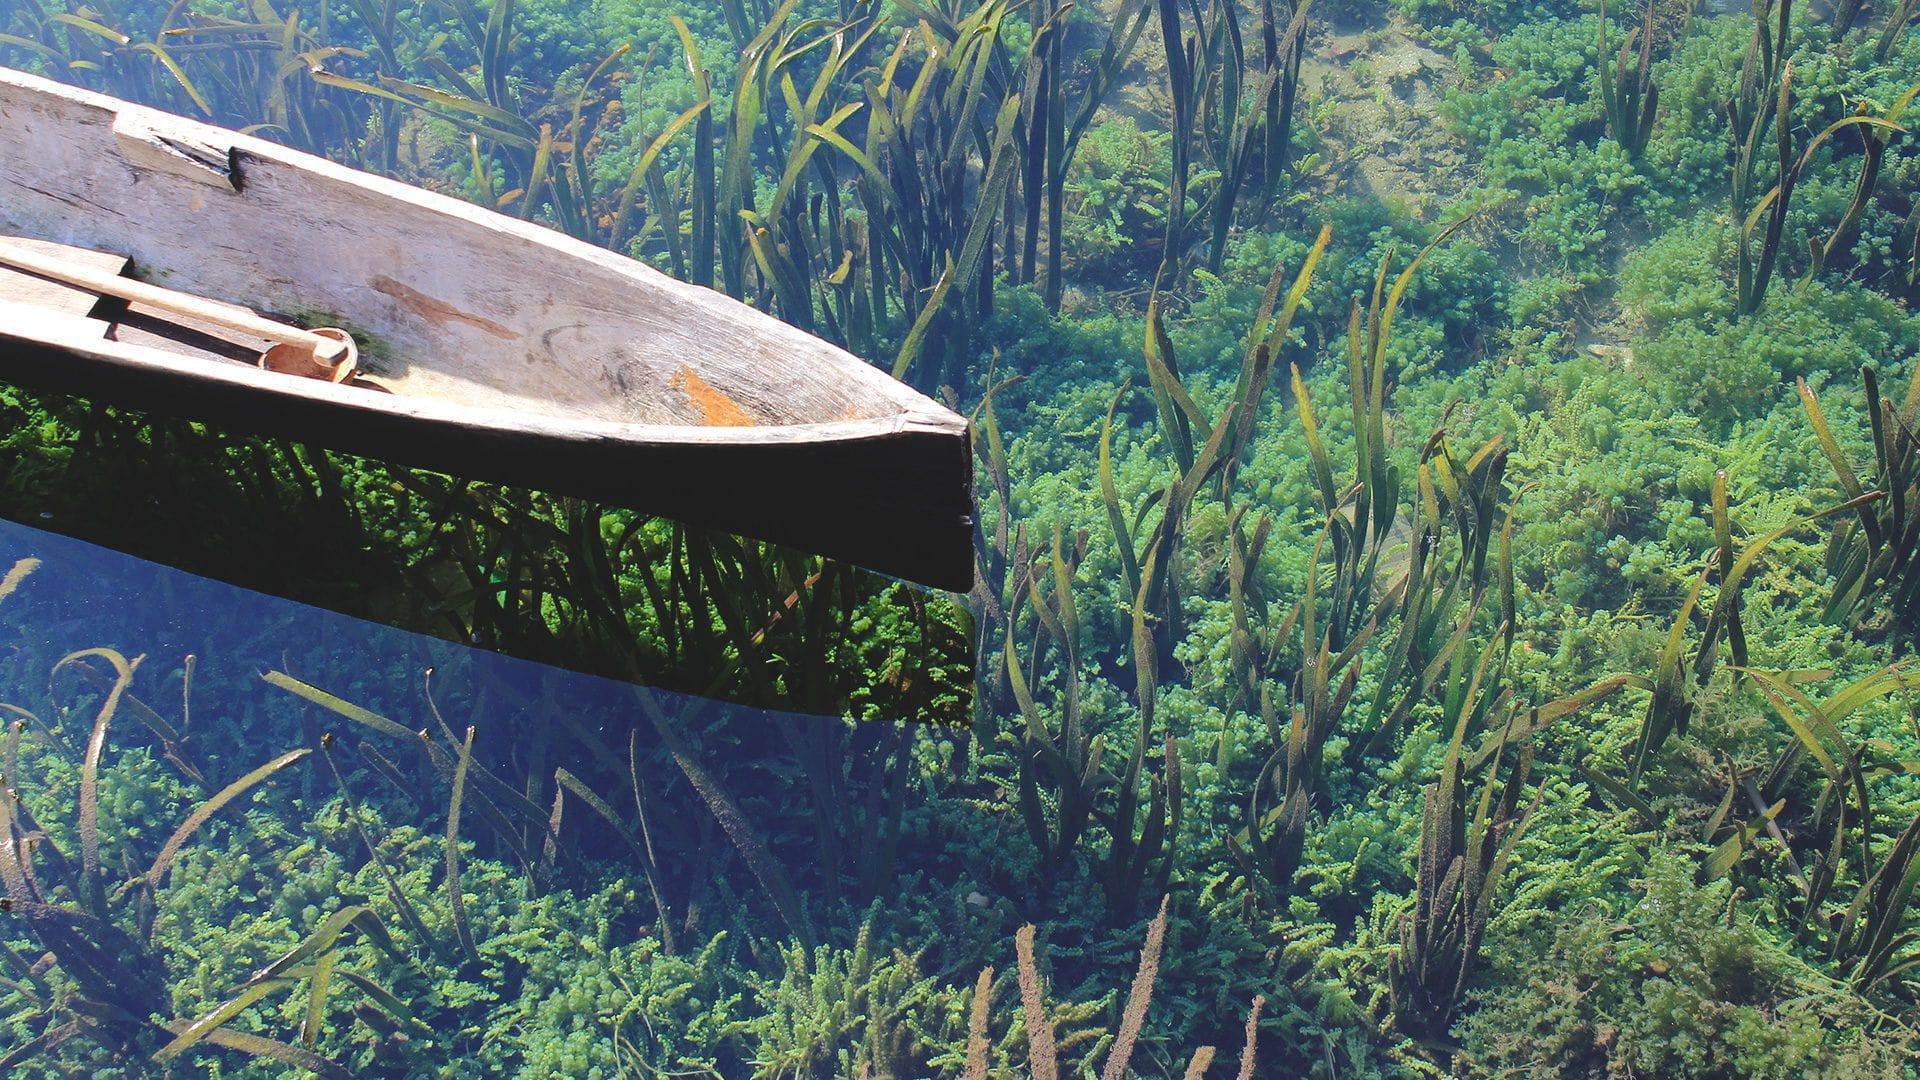 Poblados flotantes del Tonle Sap | Rojo Cangrejo Blog de Viajes